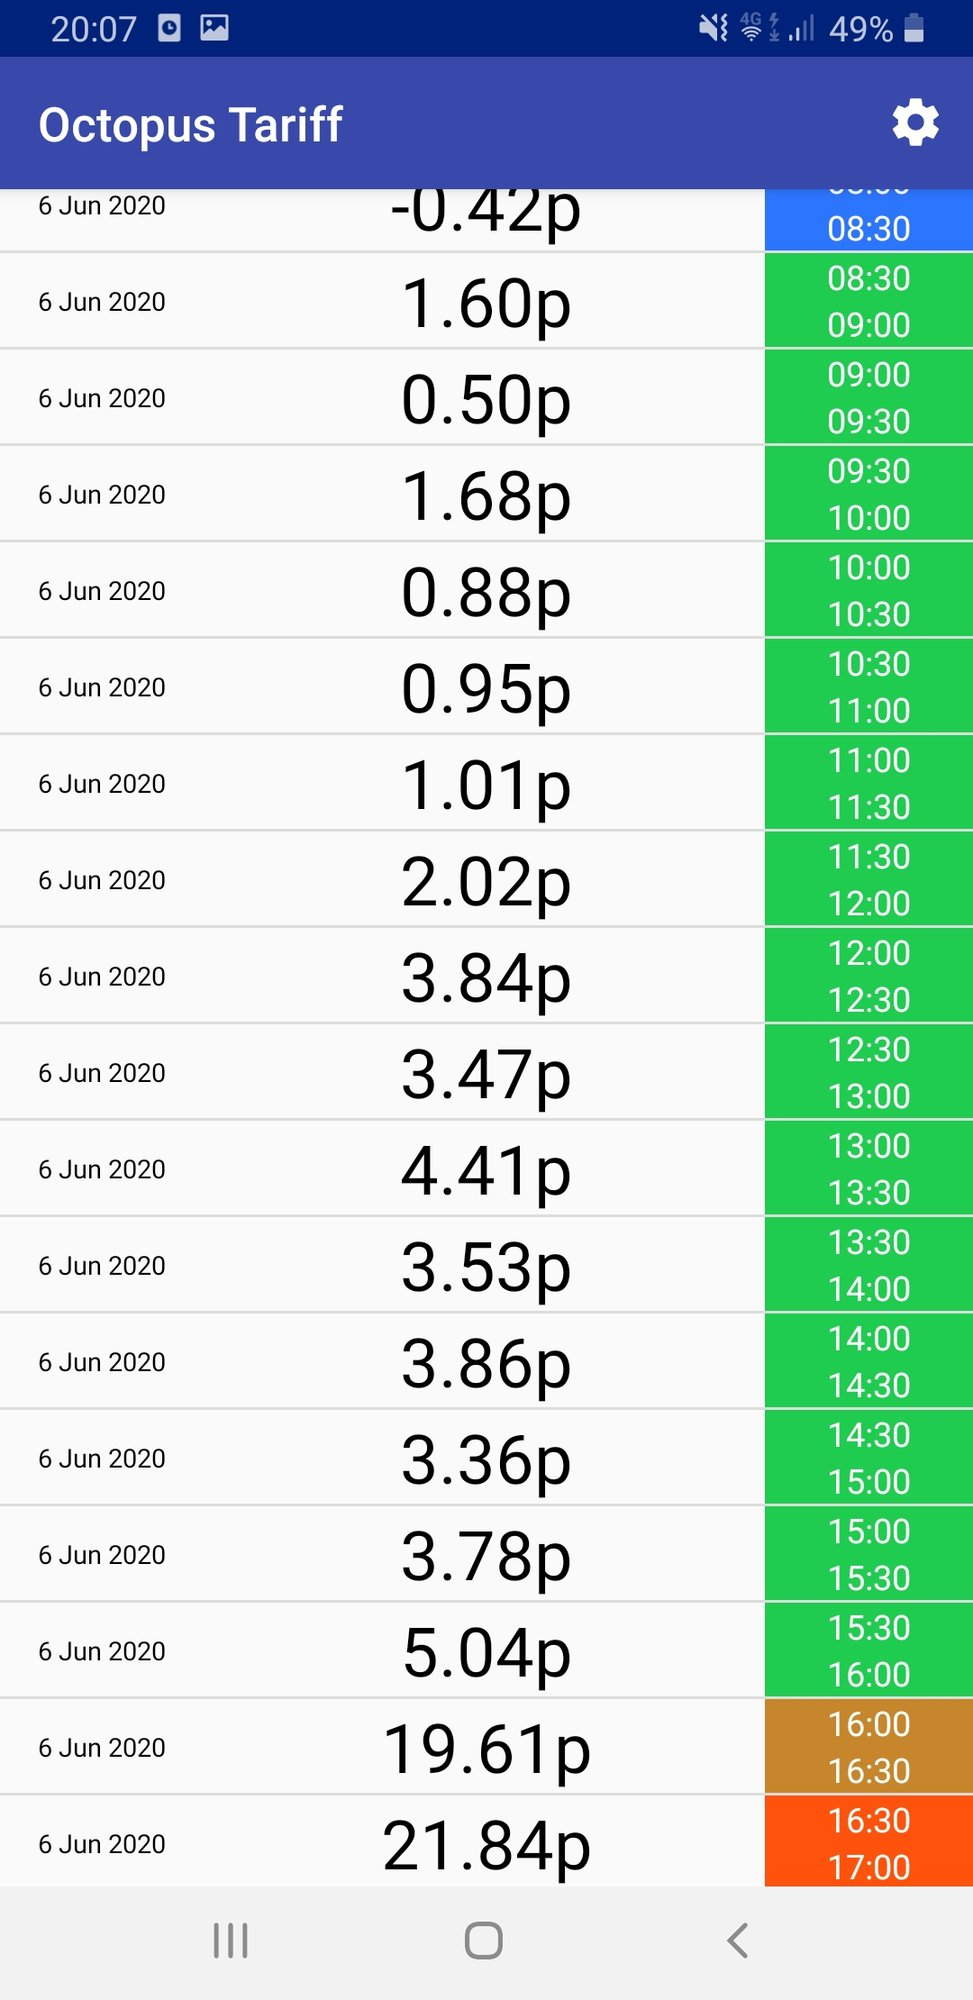 Screenshot_20200605-200709_Octopus Tariff.jpg